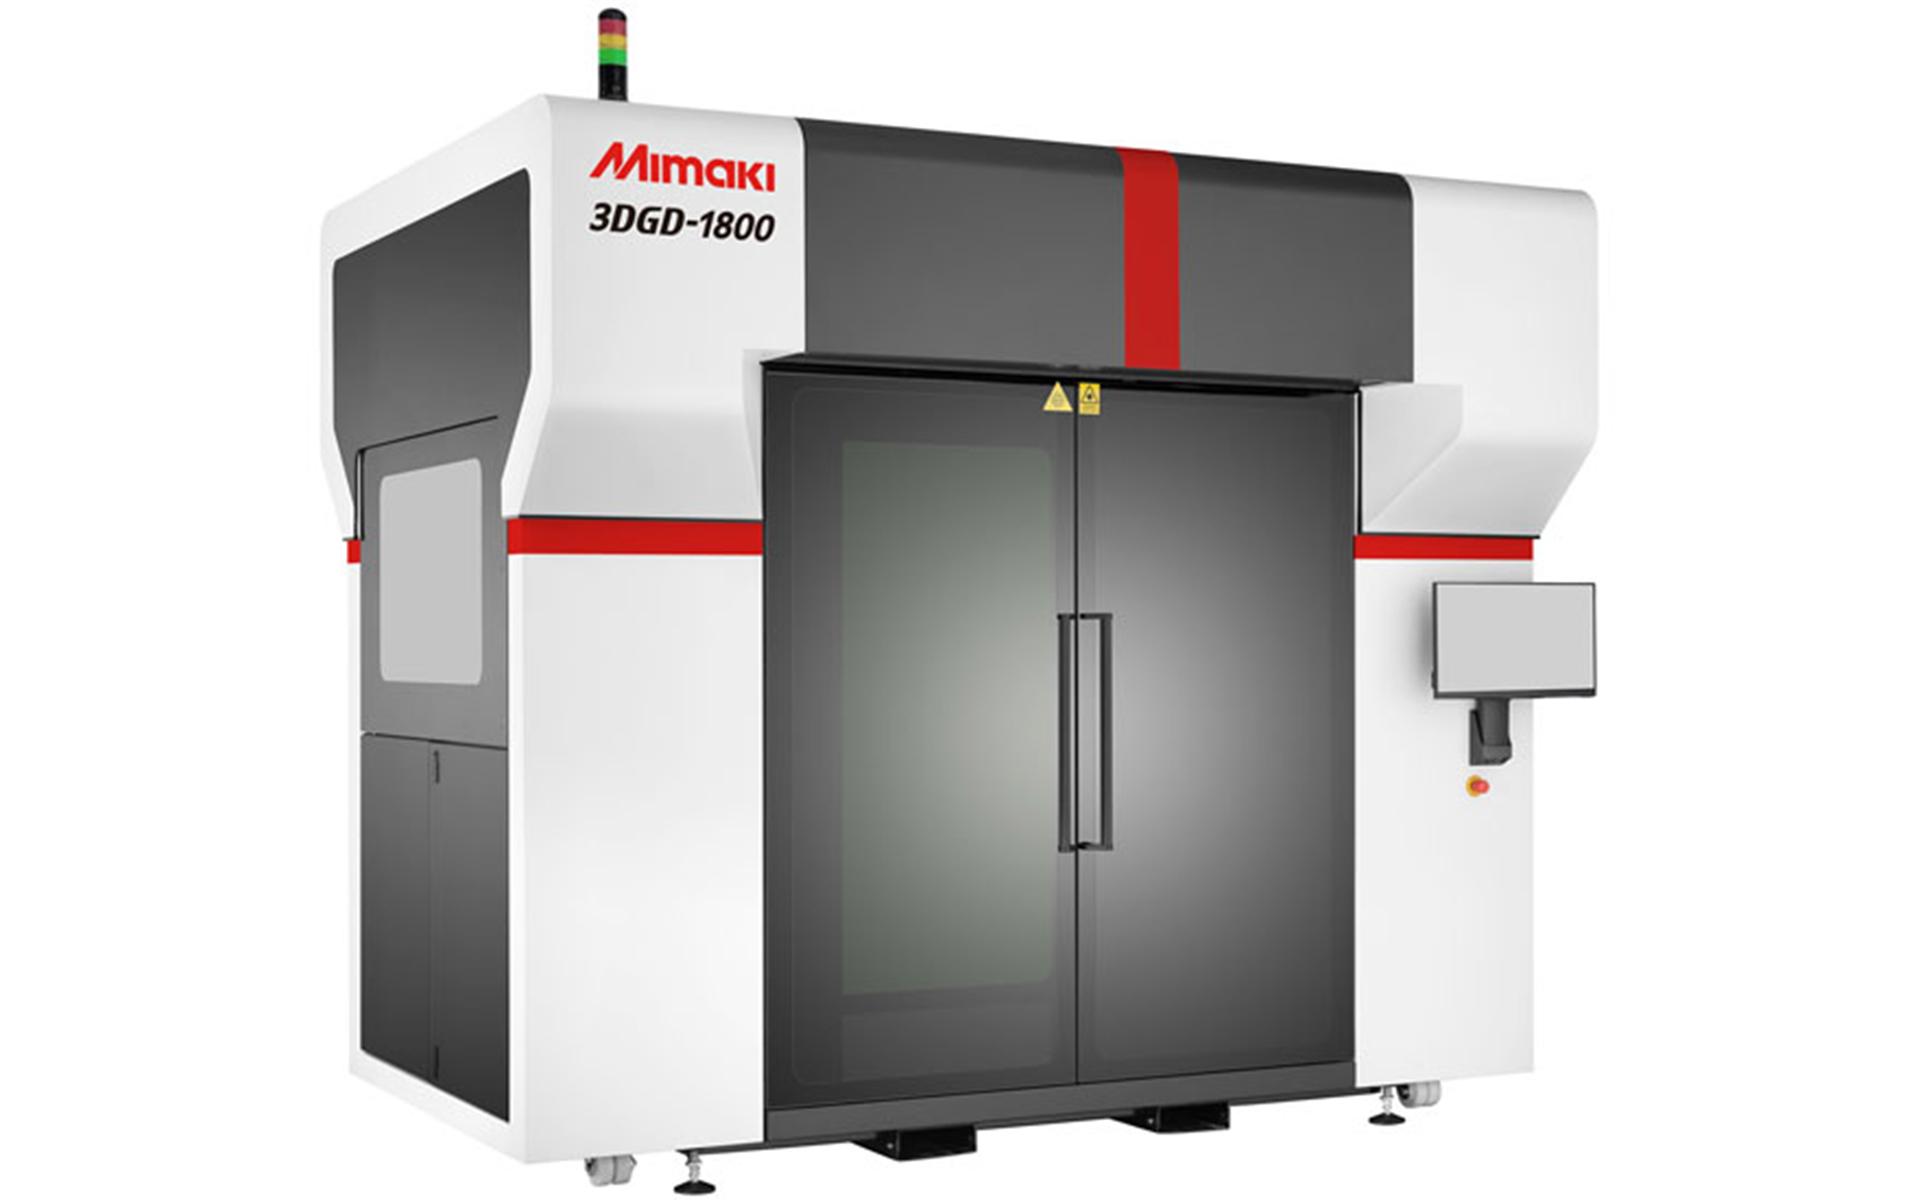 Mimaki 3DGD-1800